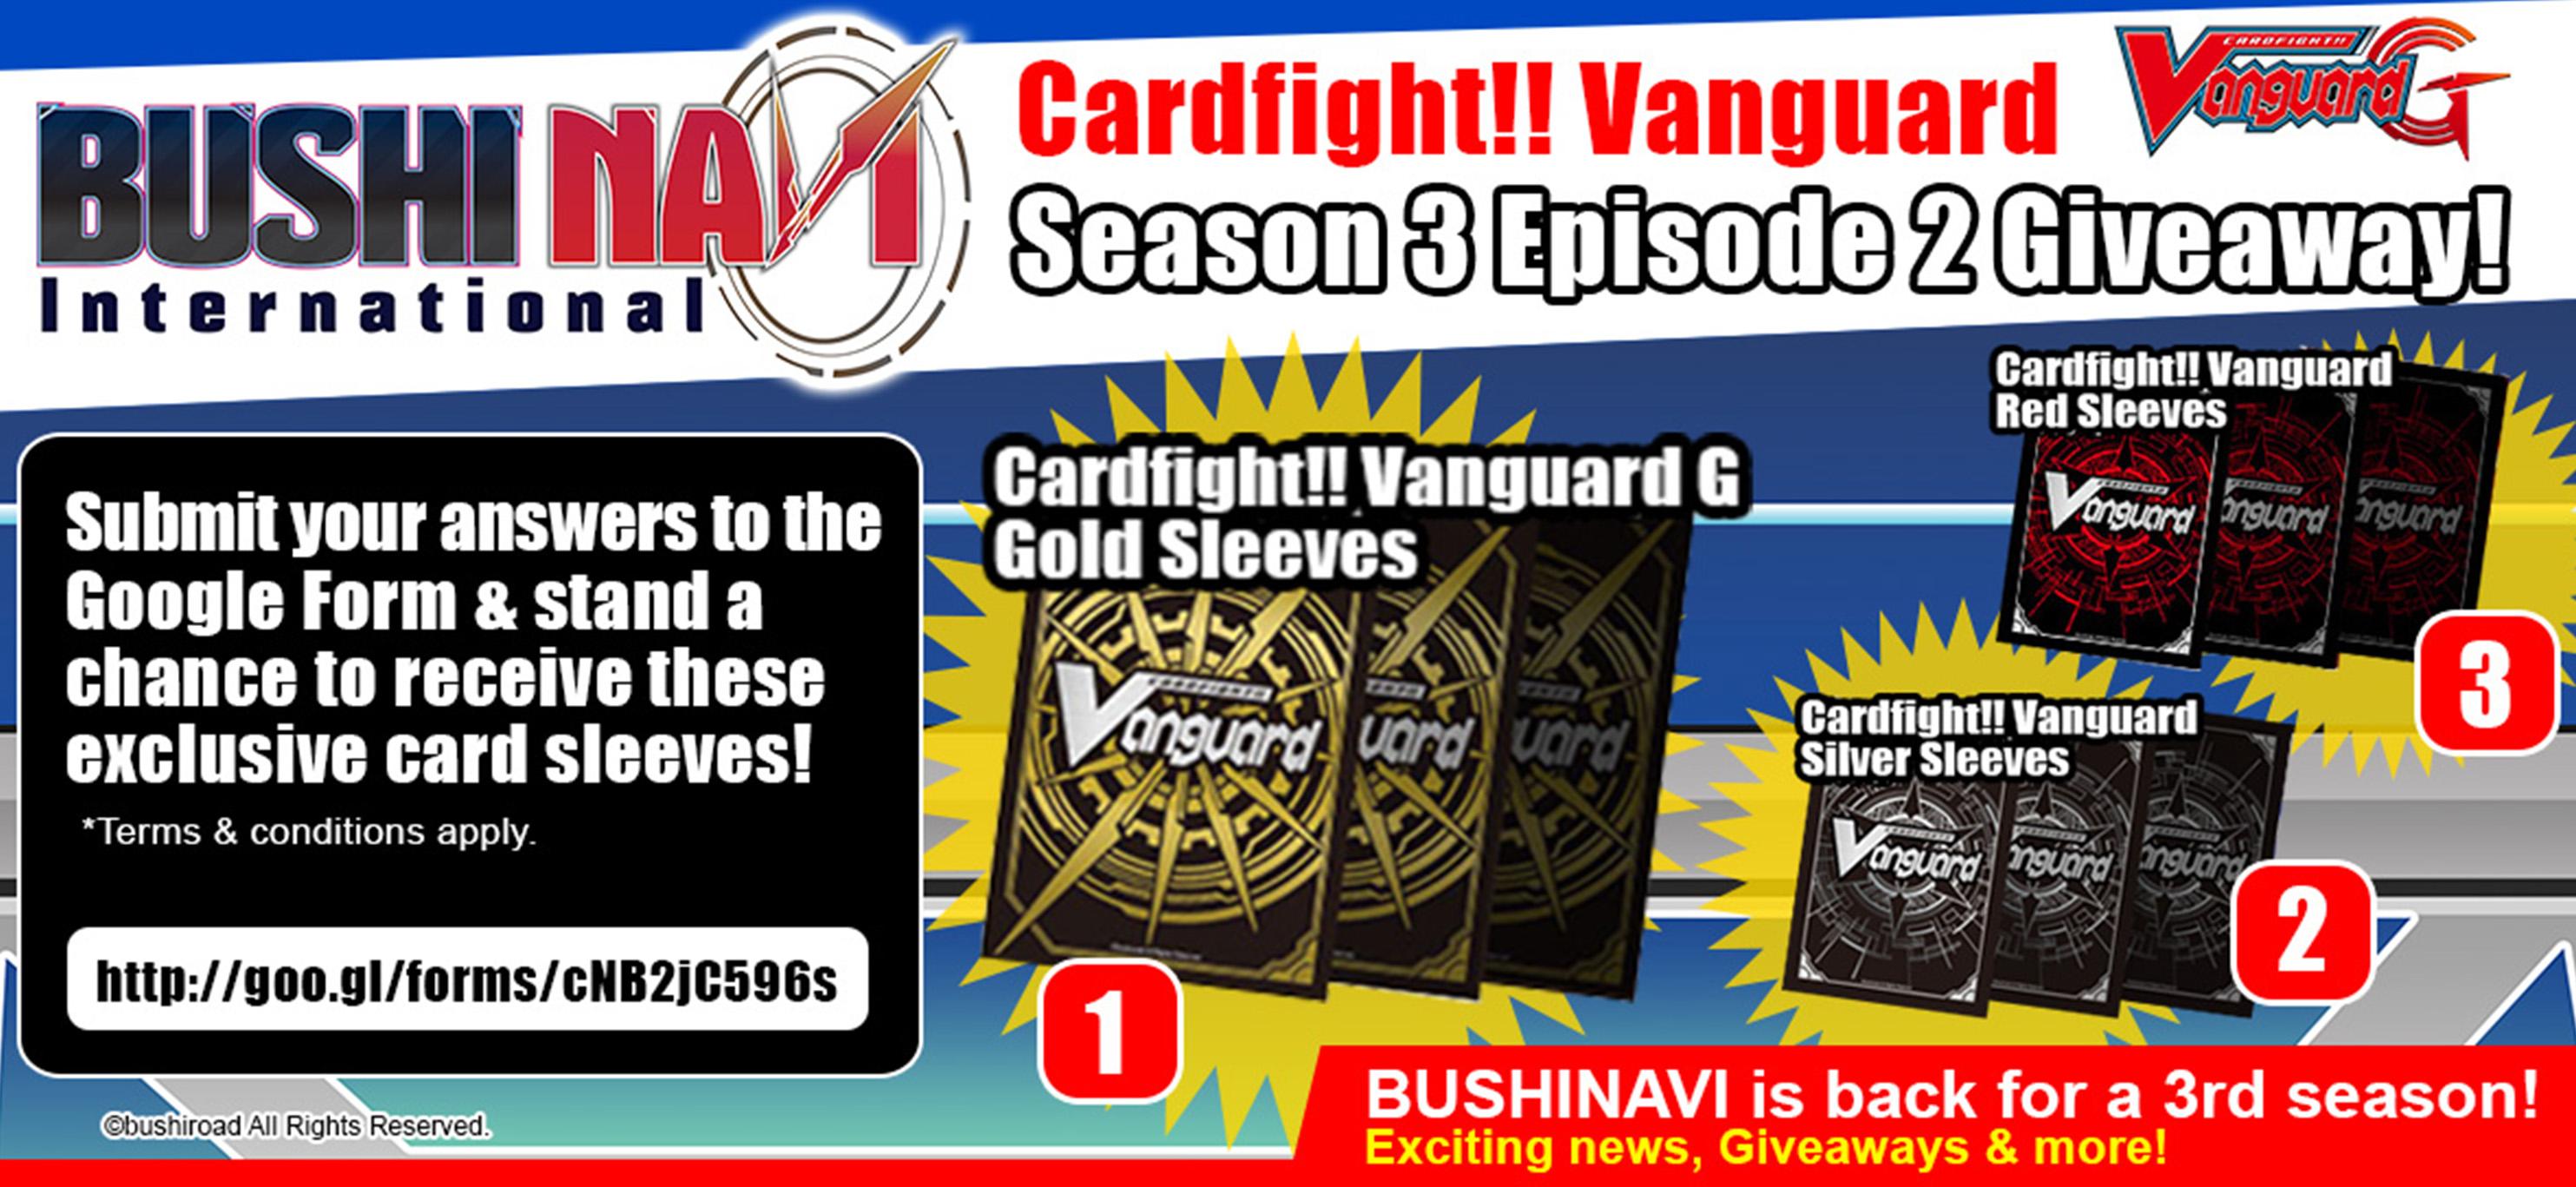 BUSHI NAVI International Season 3 Episode 2